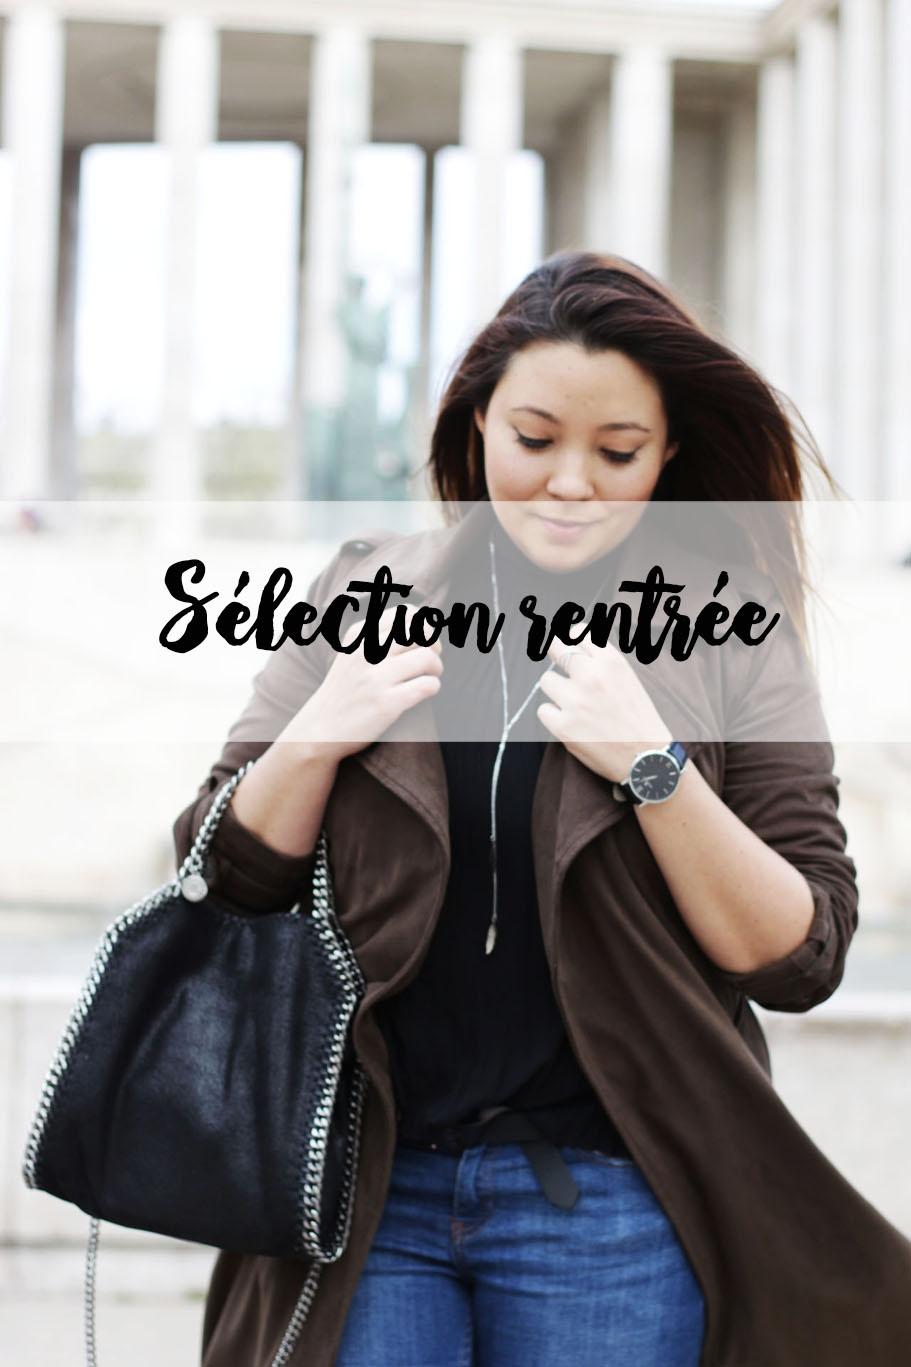 Stella Celine Blogueuse Mccartney Inspi De Inspiration Luxe Mode Sac Sheinside ExCUwRqAC